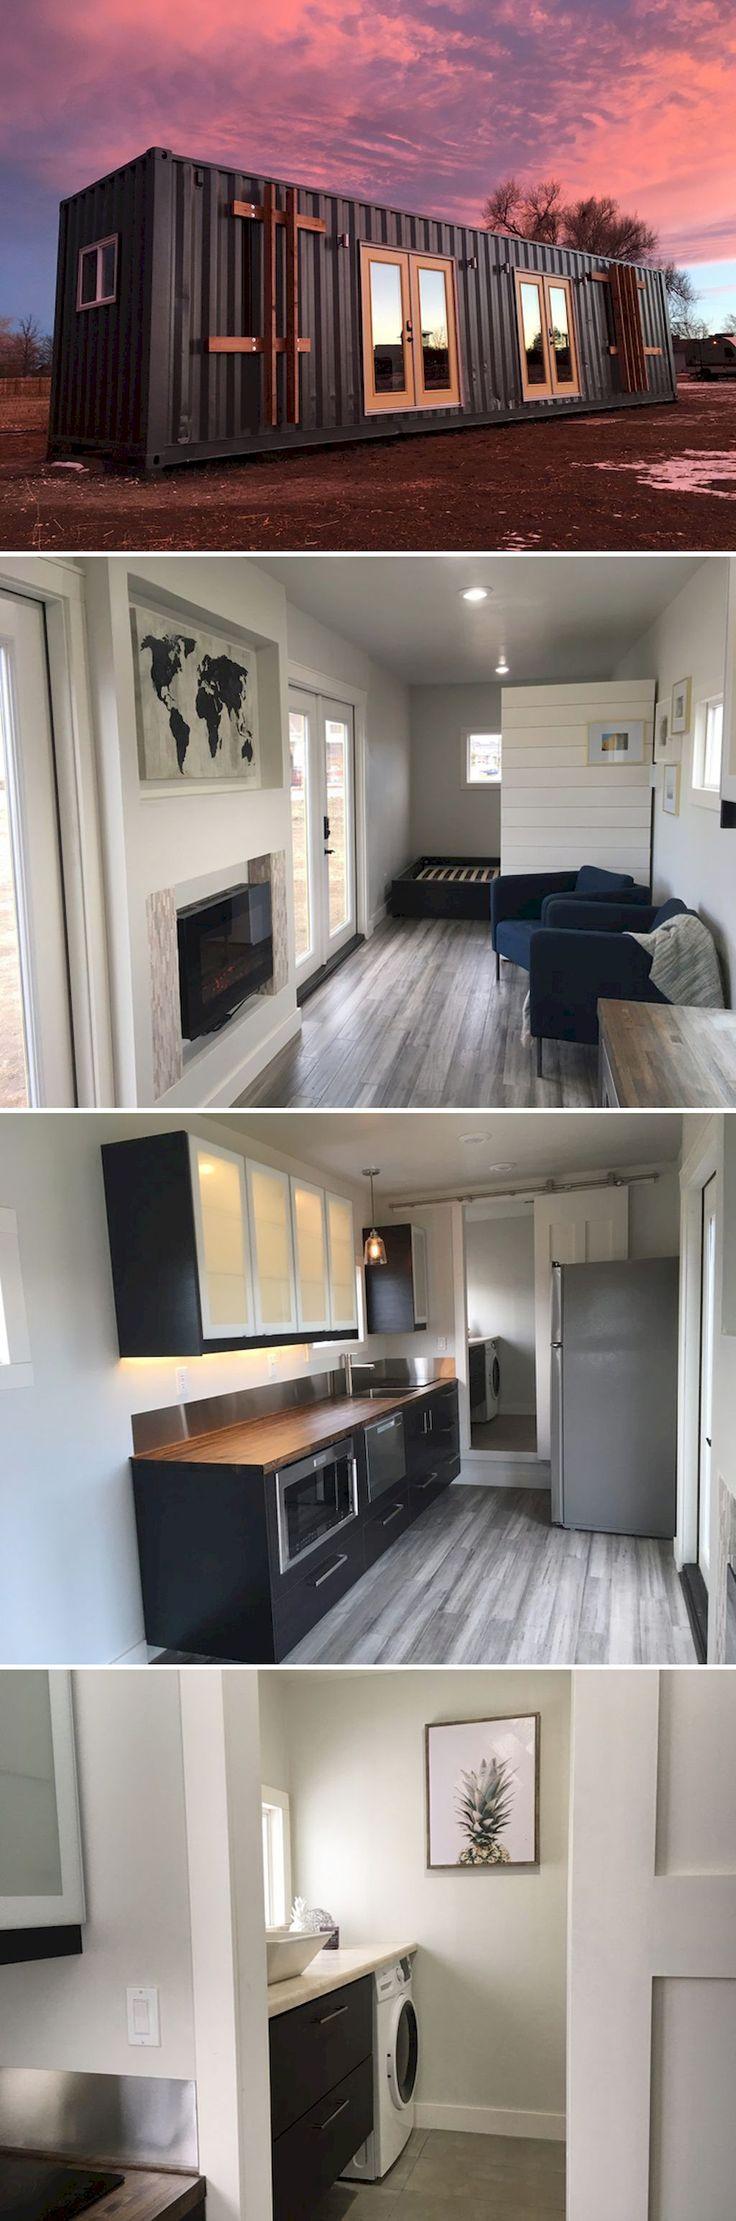 Nice 70 Tiny House Bus Living Design and Decorating Ideas https://homearchite.com/2017/09/14/70-tiny-house-bus-living-design-decorating-ideas/